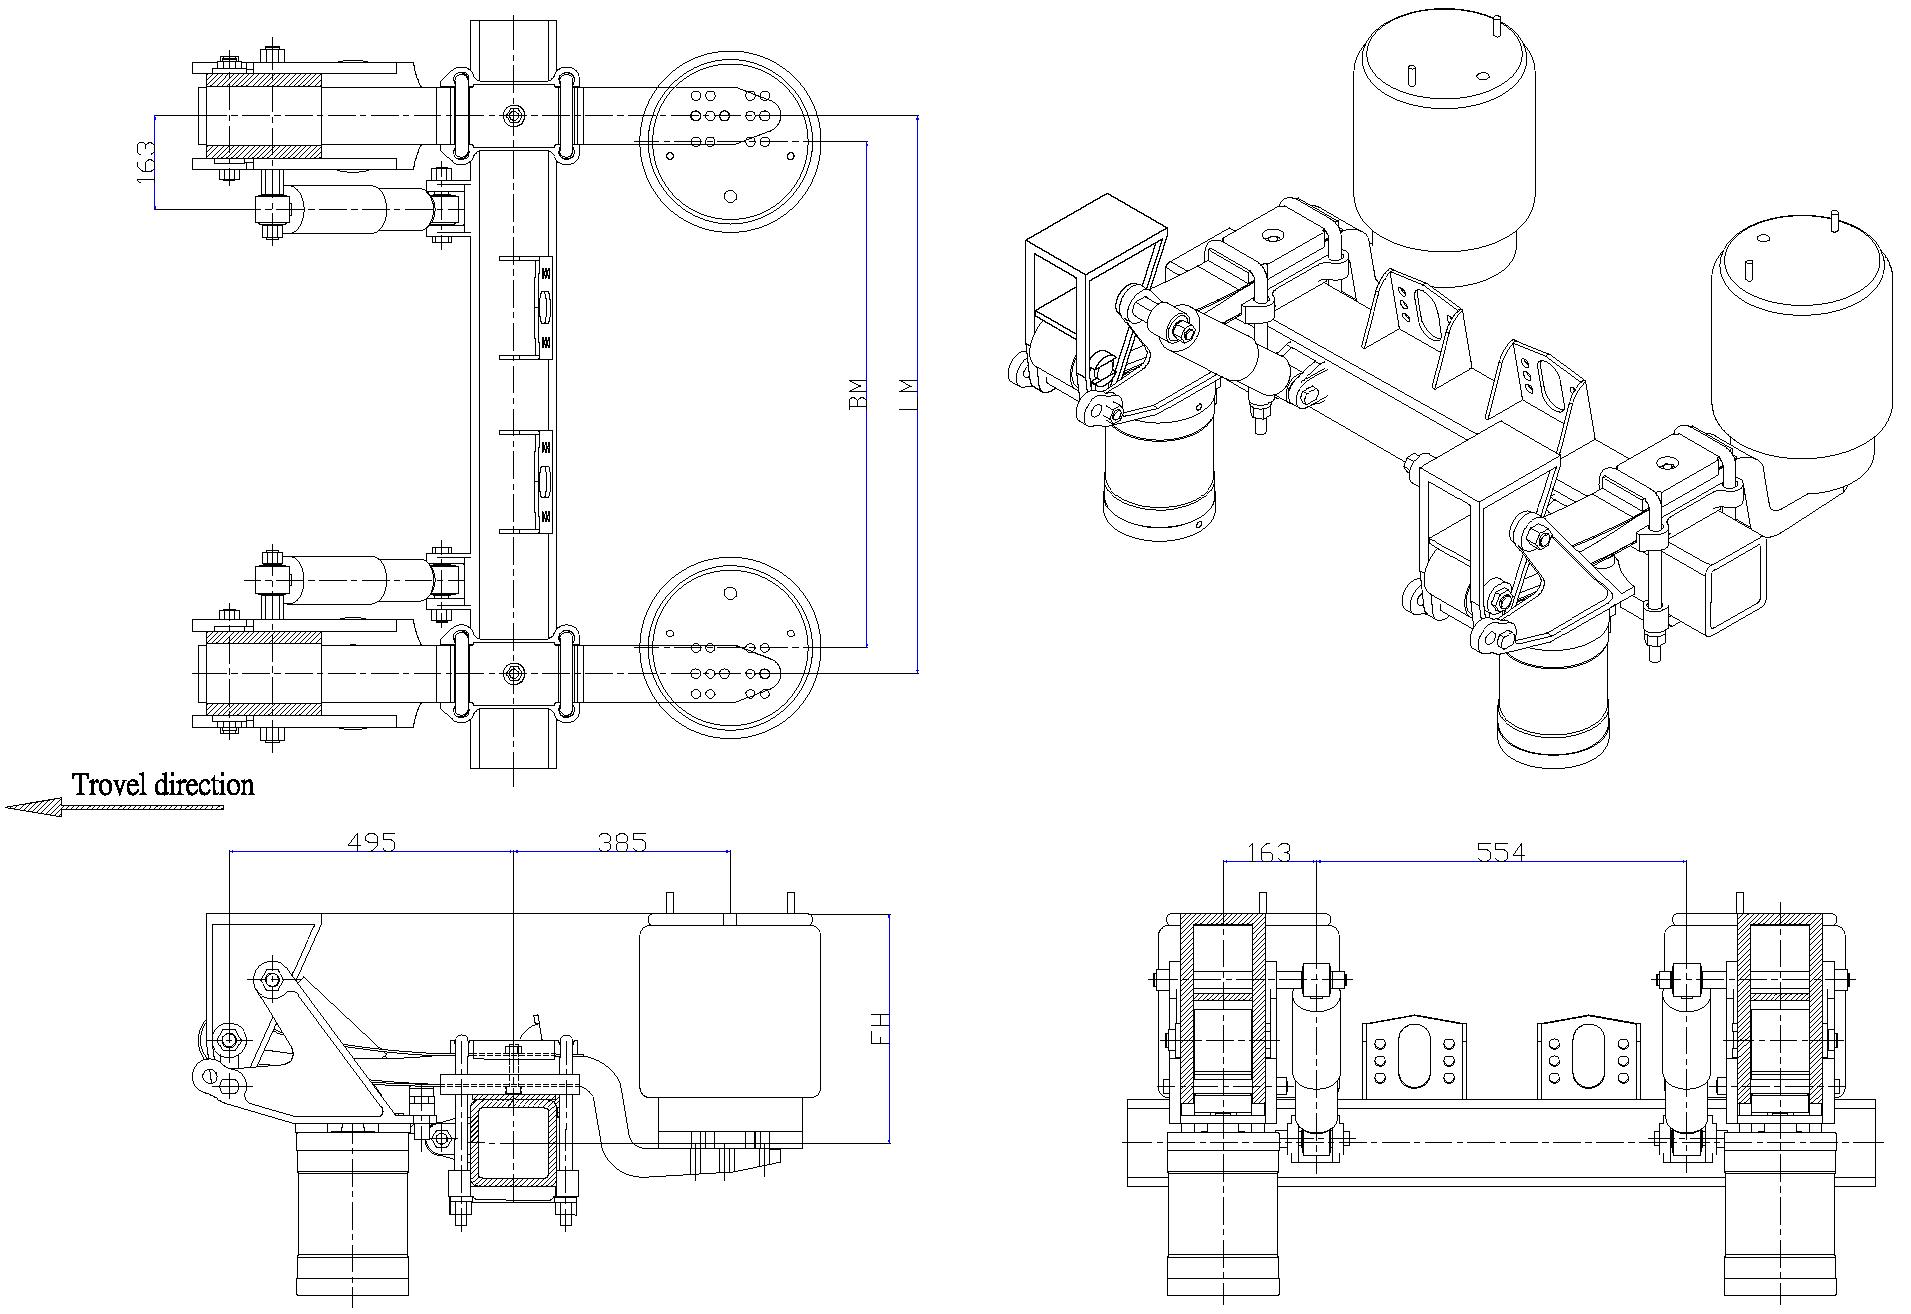 14513806941604198901 2000 peterbilt 379 fuse panel diagram 2000 car wiring diagram,Kenworth T600 Wiring Diagram Download